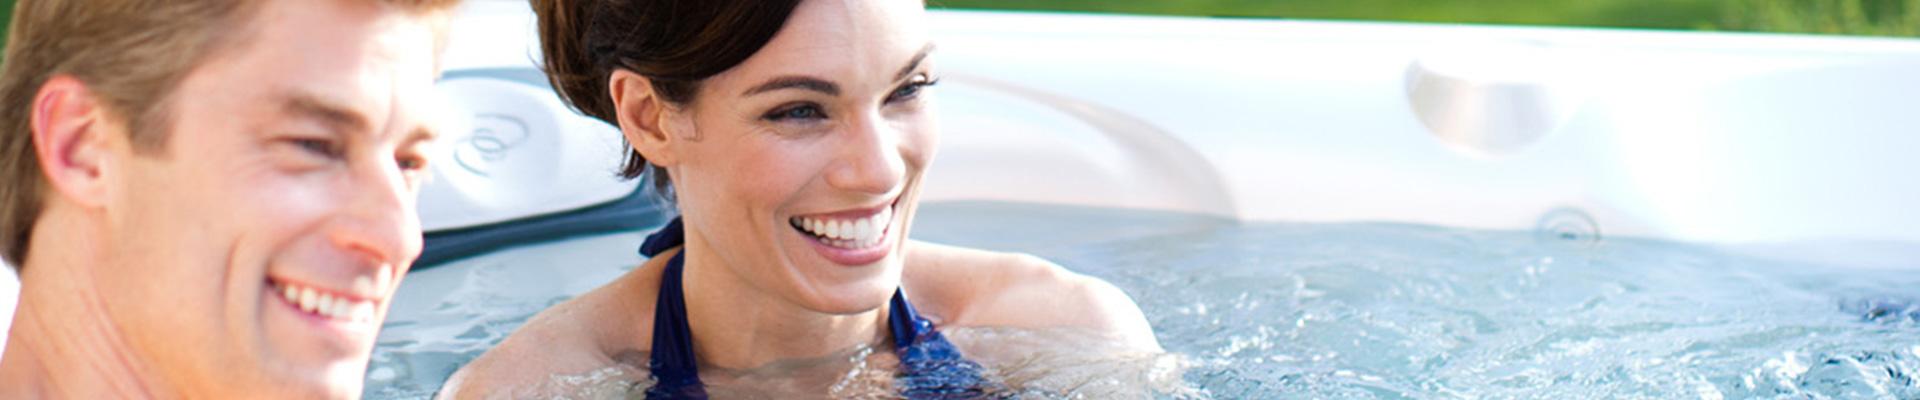 Need a Mental Boost, Soak in a Backyard Spa, Hot Tubs Dealer Washington MO